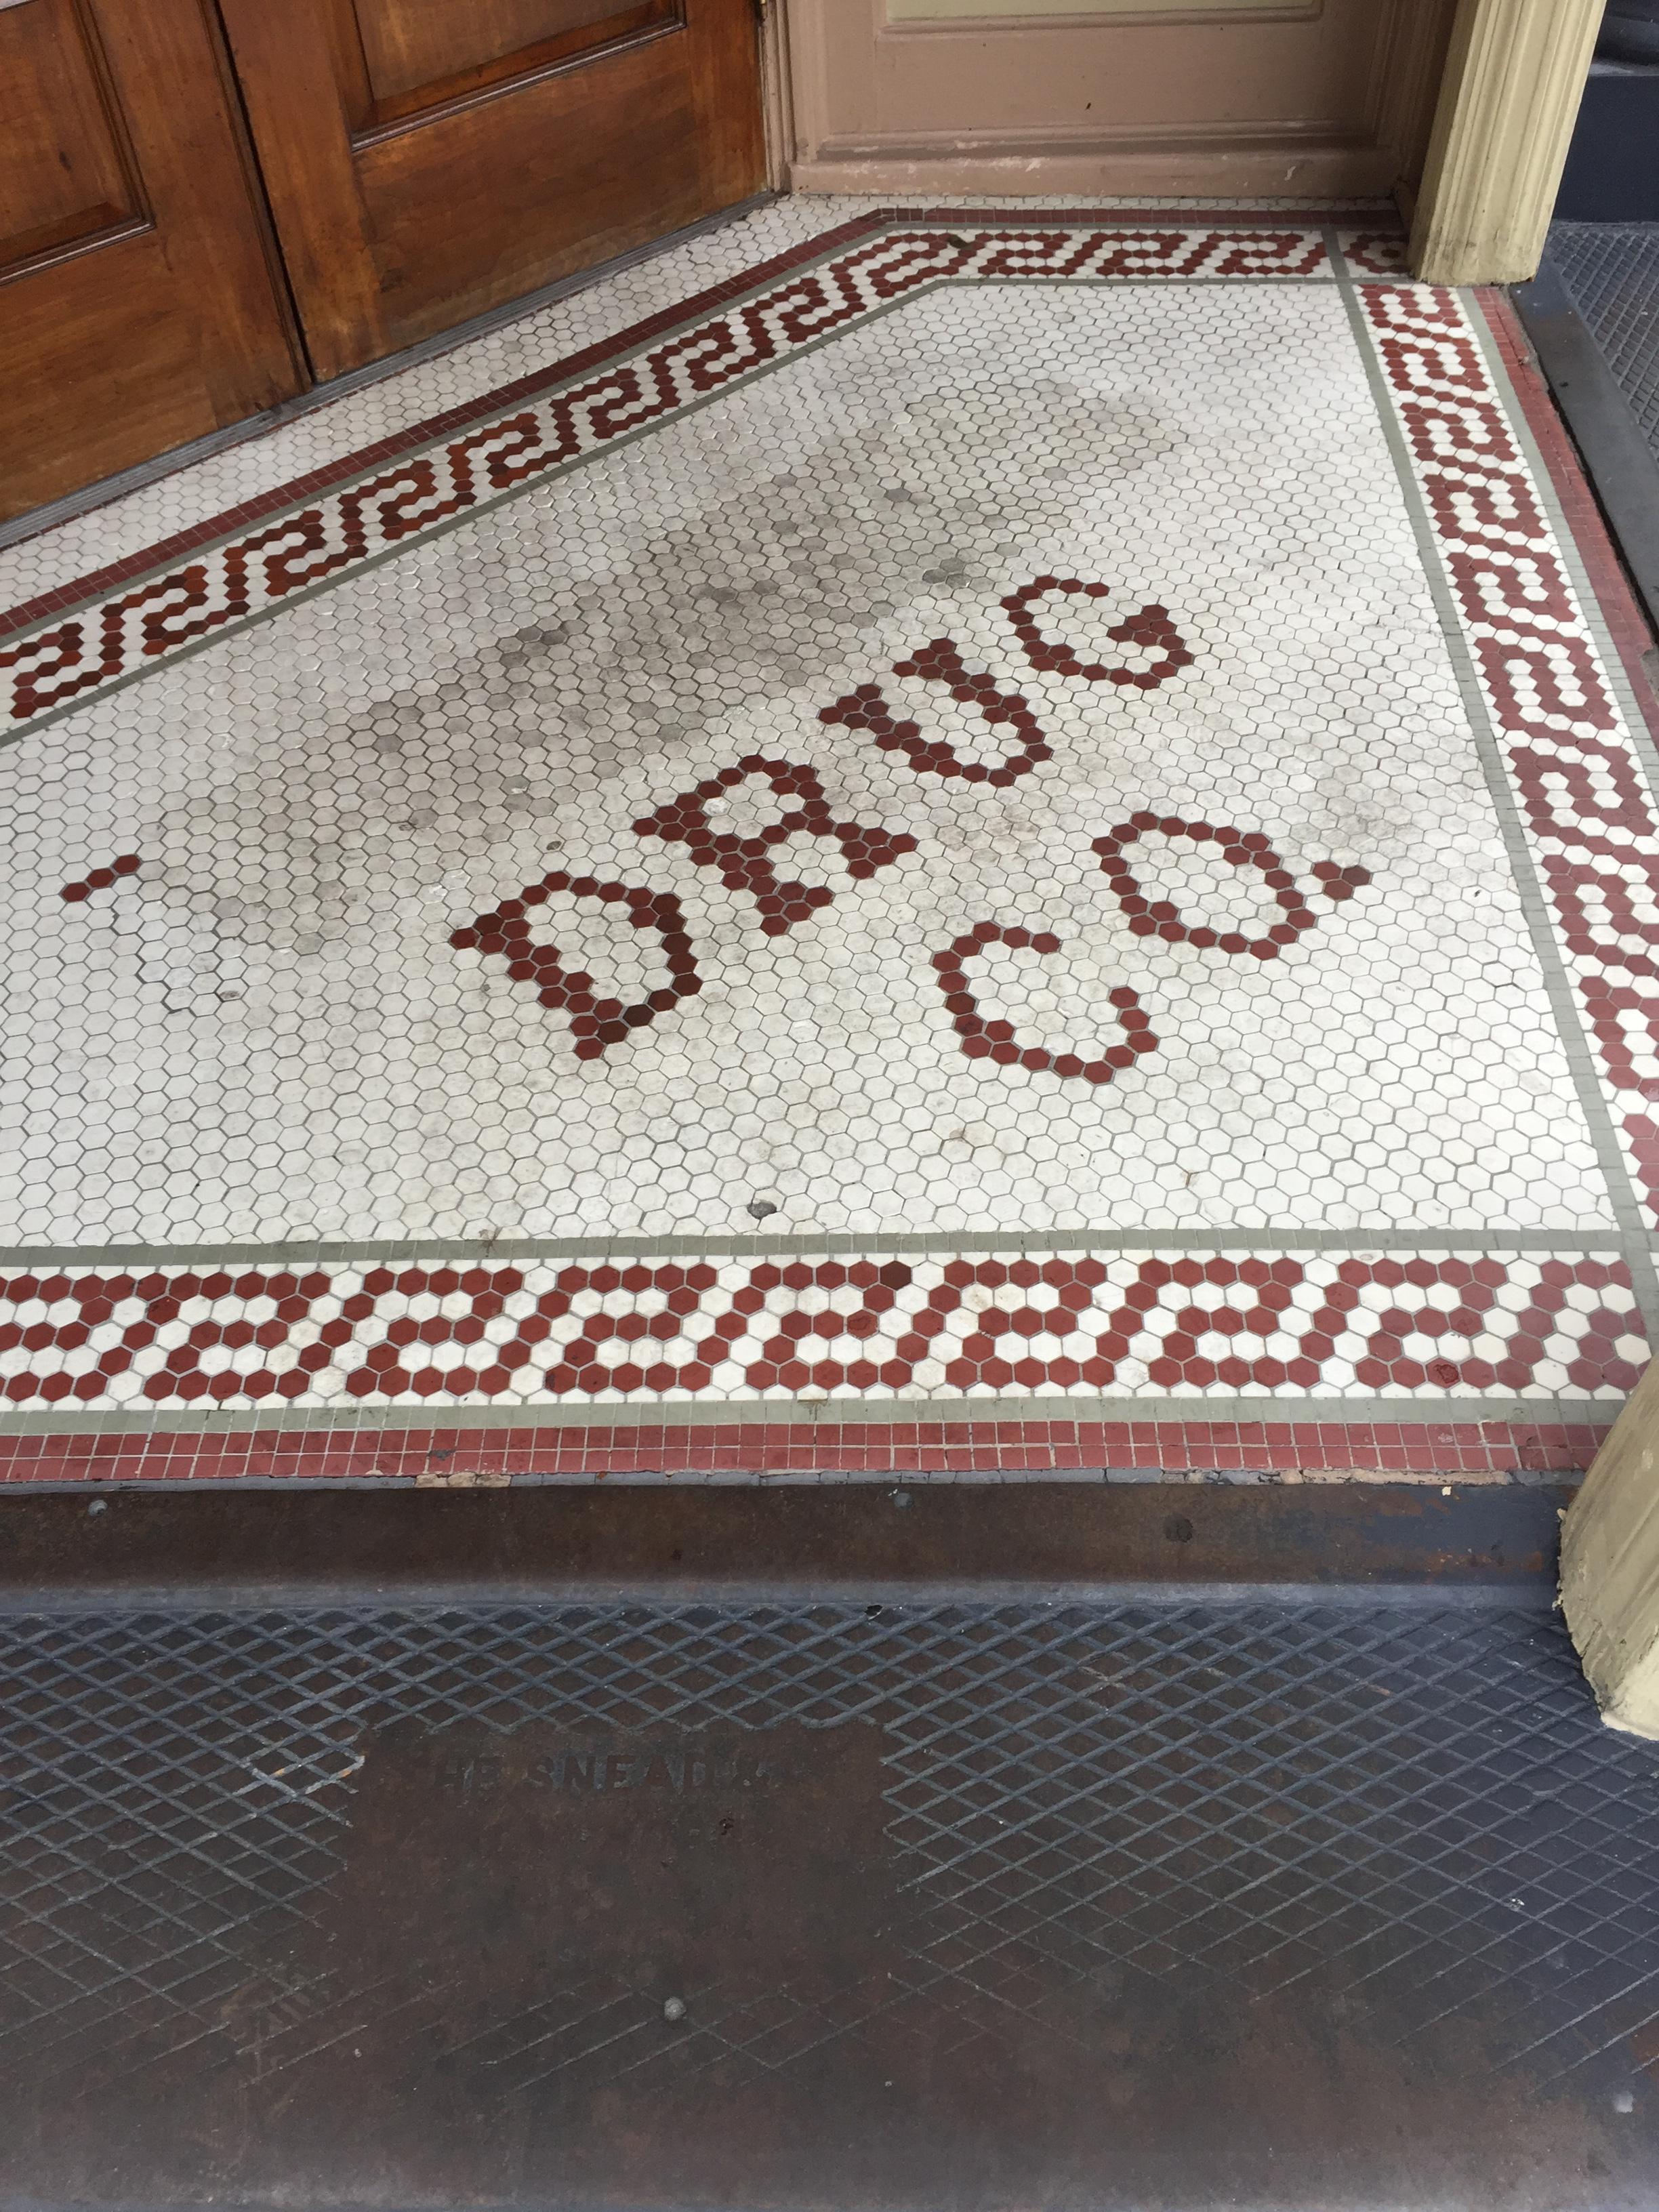 Original mosaic floor when entering Harry's Seafood